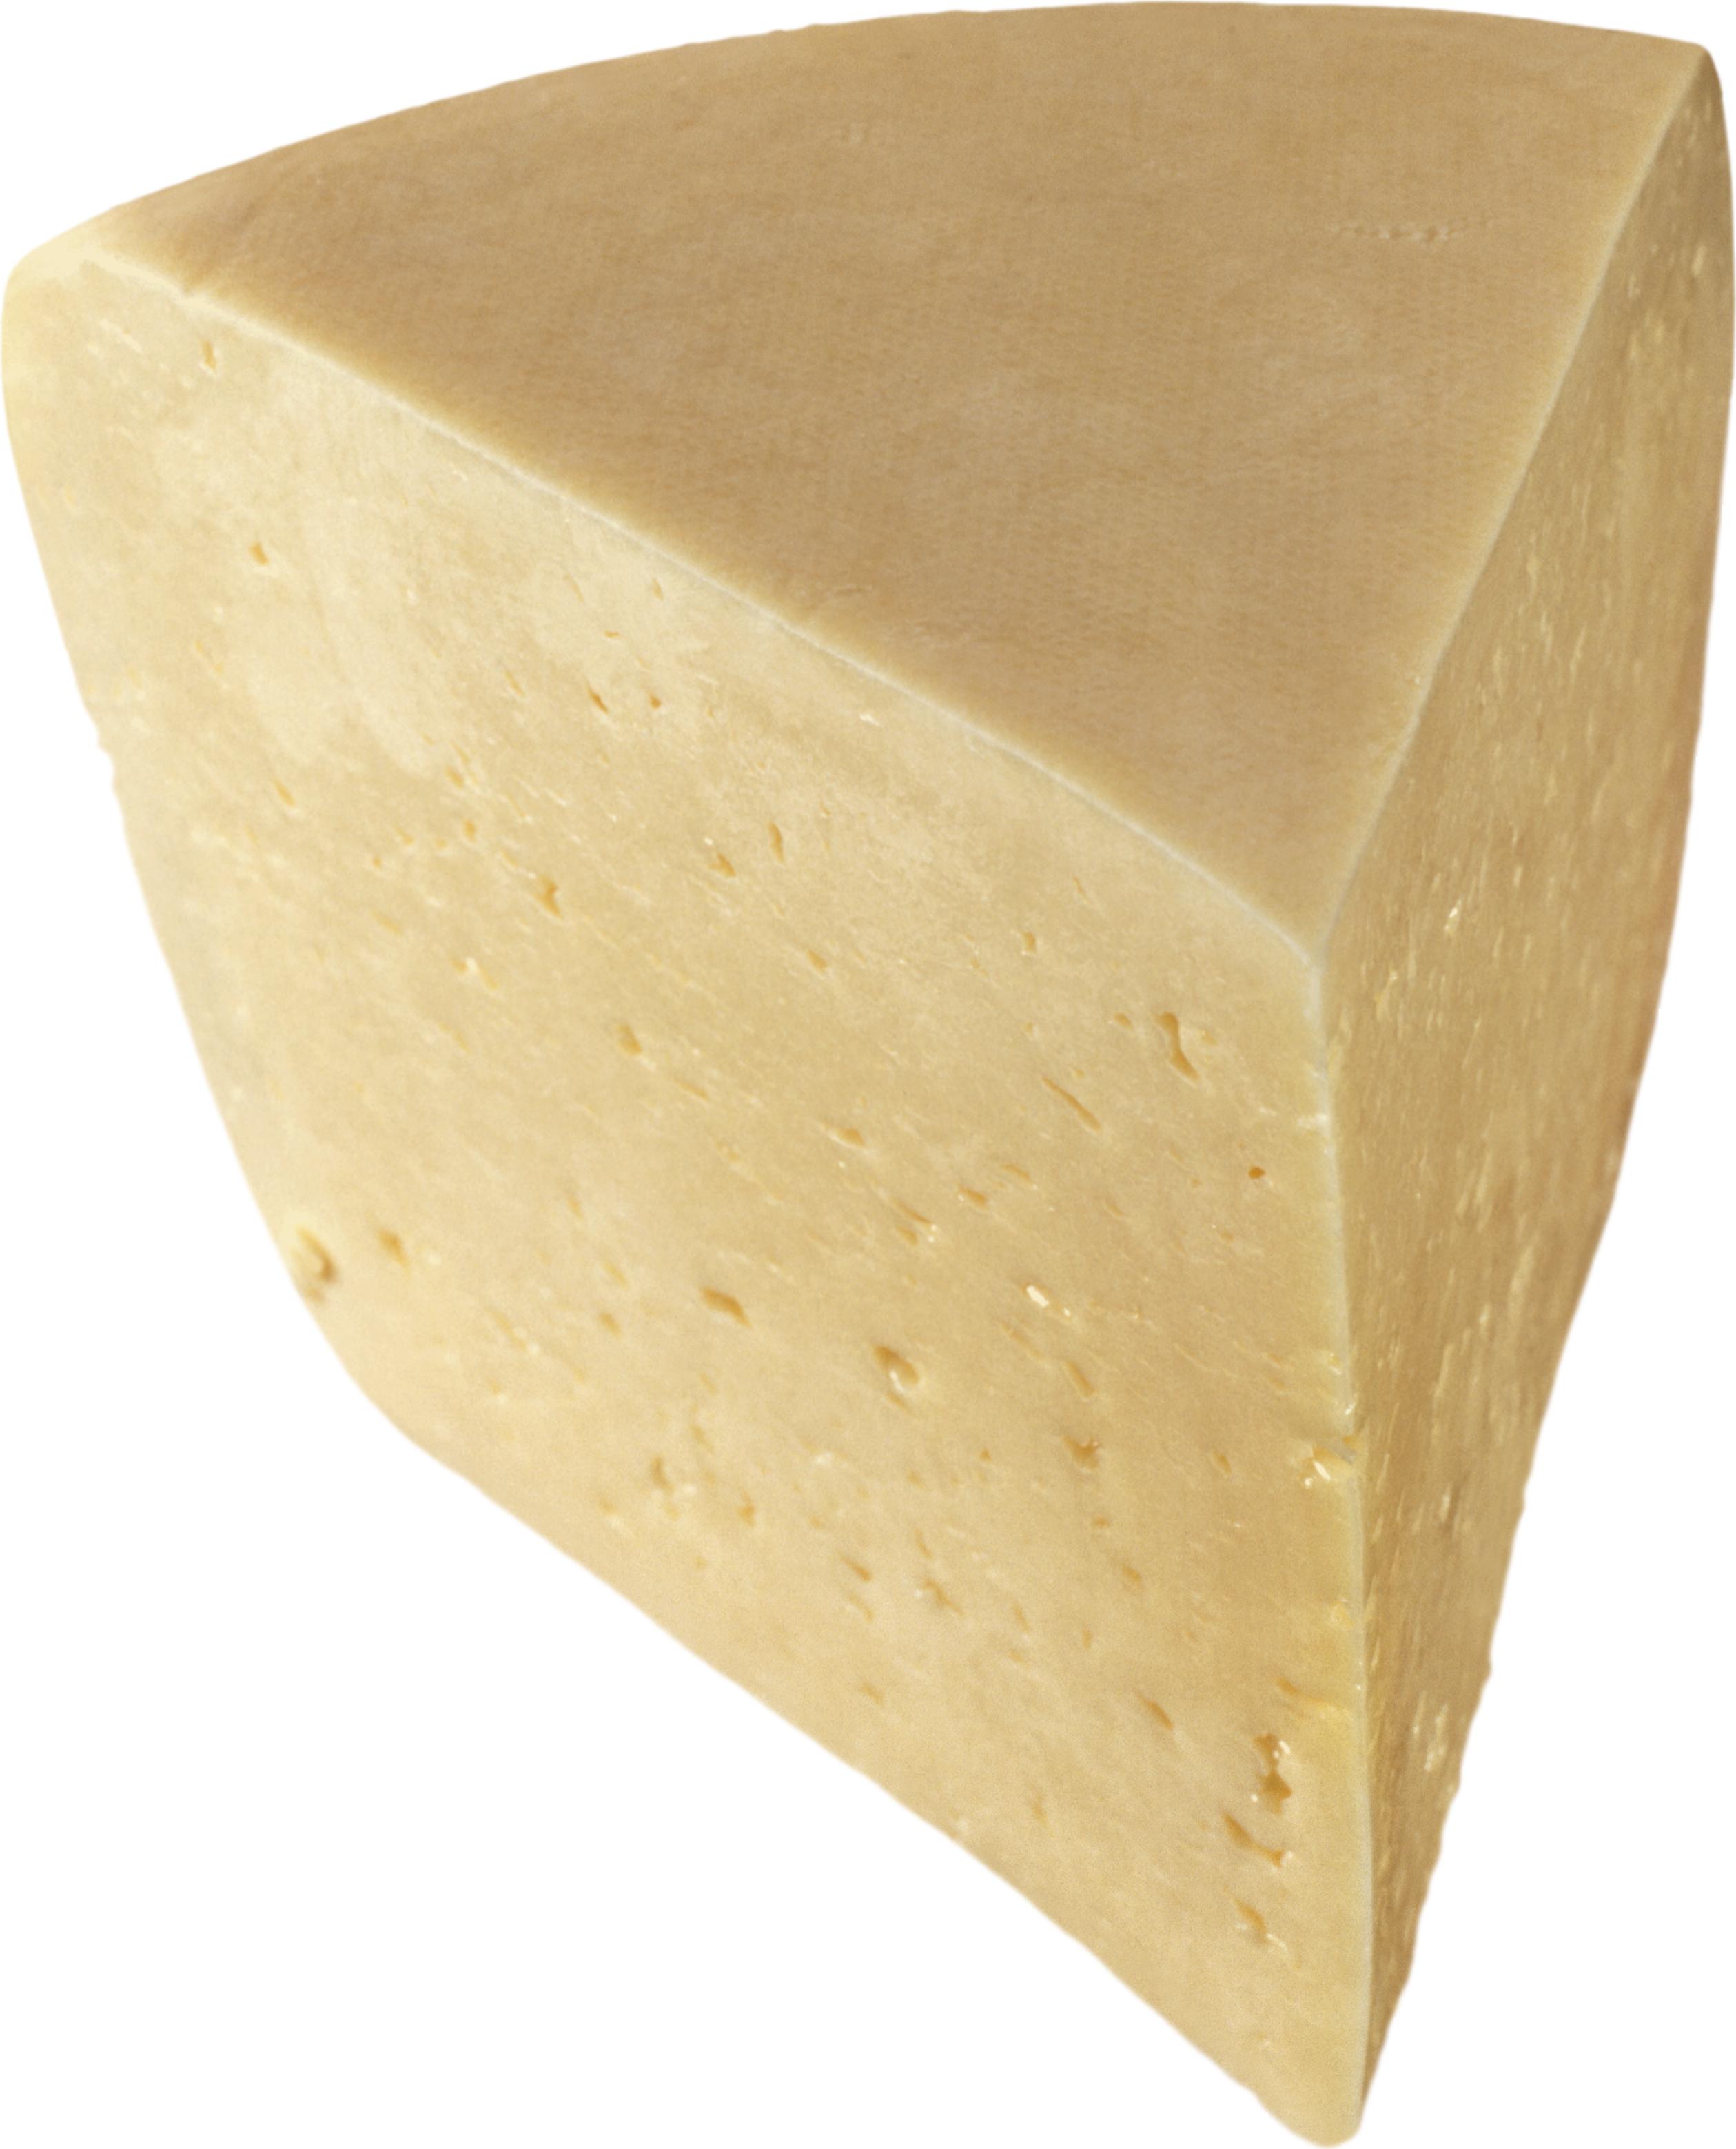 Cheese clipart parmesan. Transparent png image web